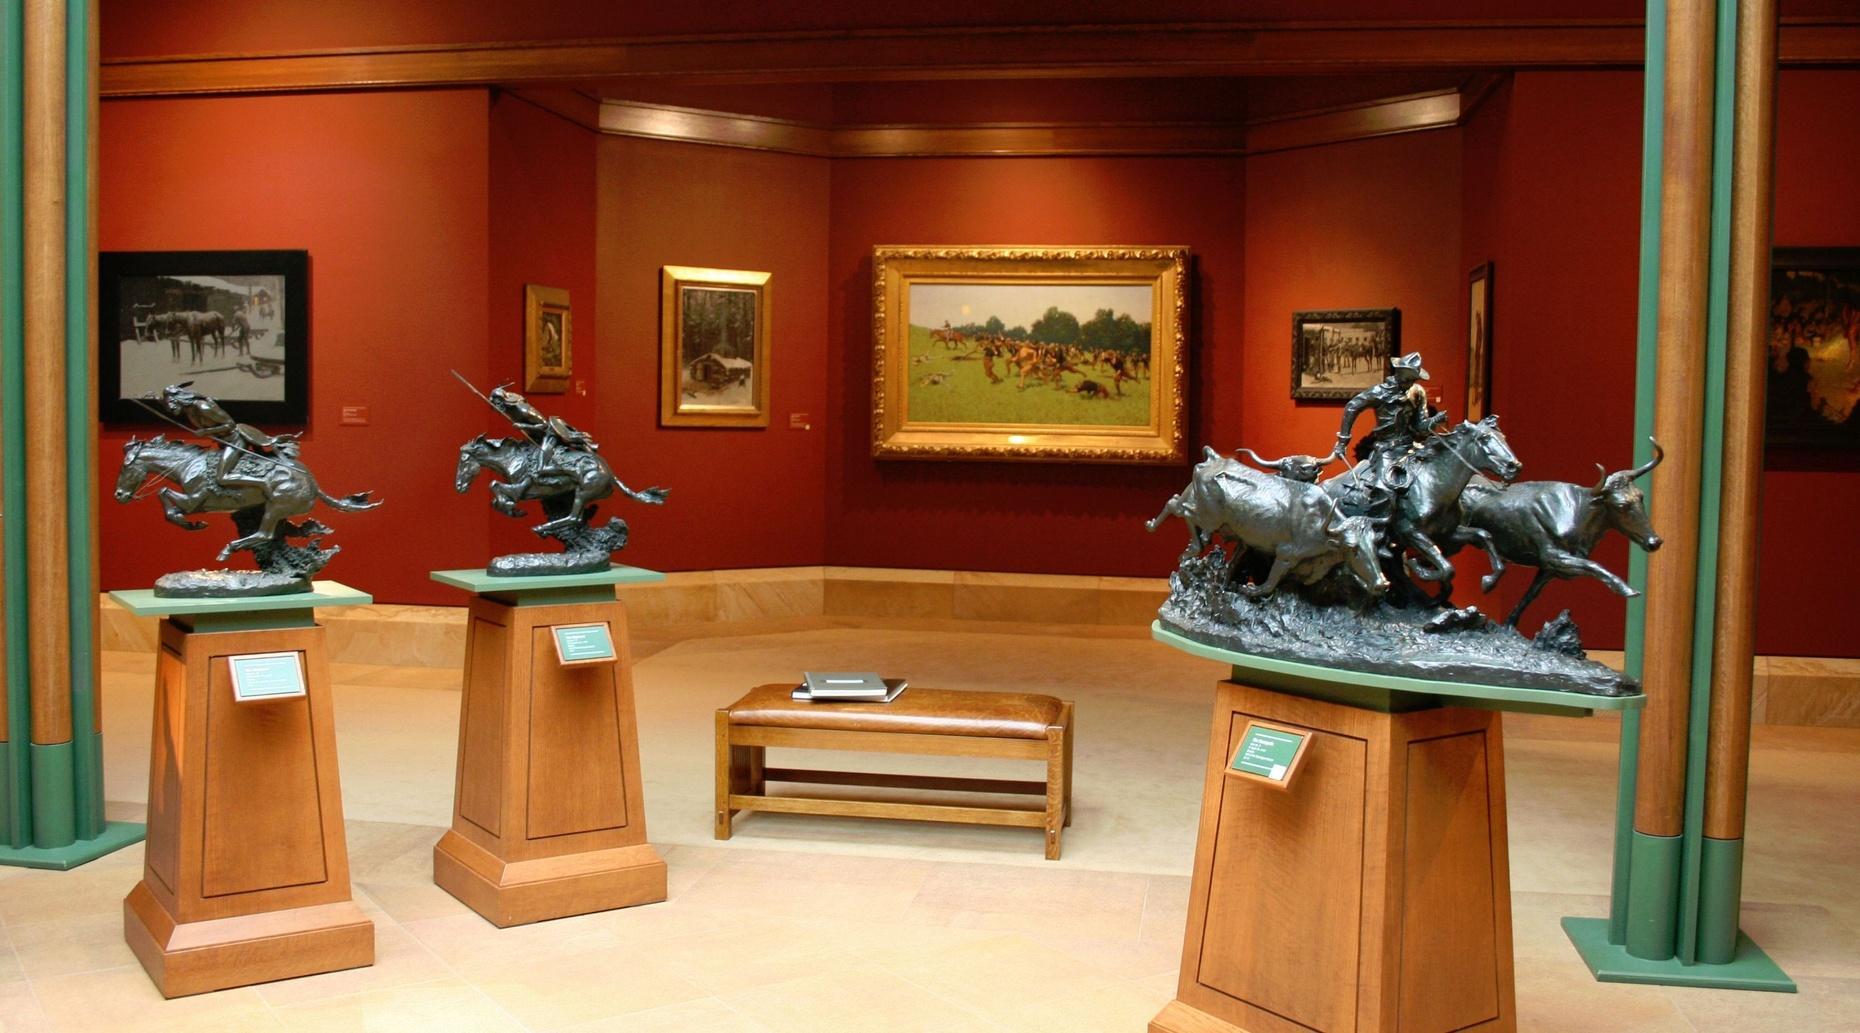 Frederic Remington Artwork Tour in Ogdensburg